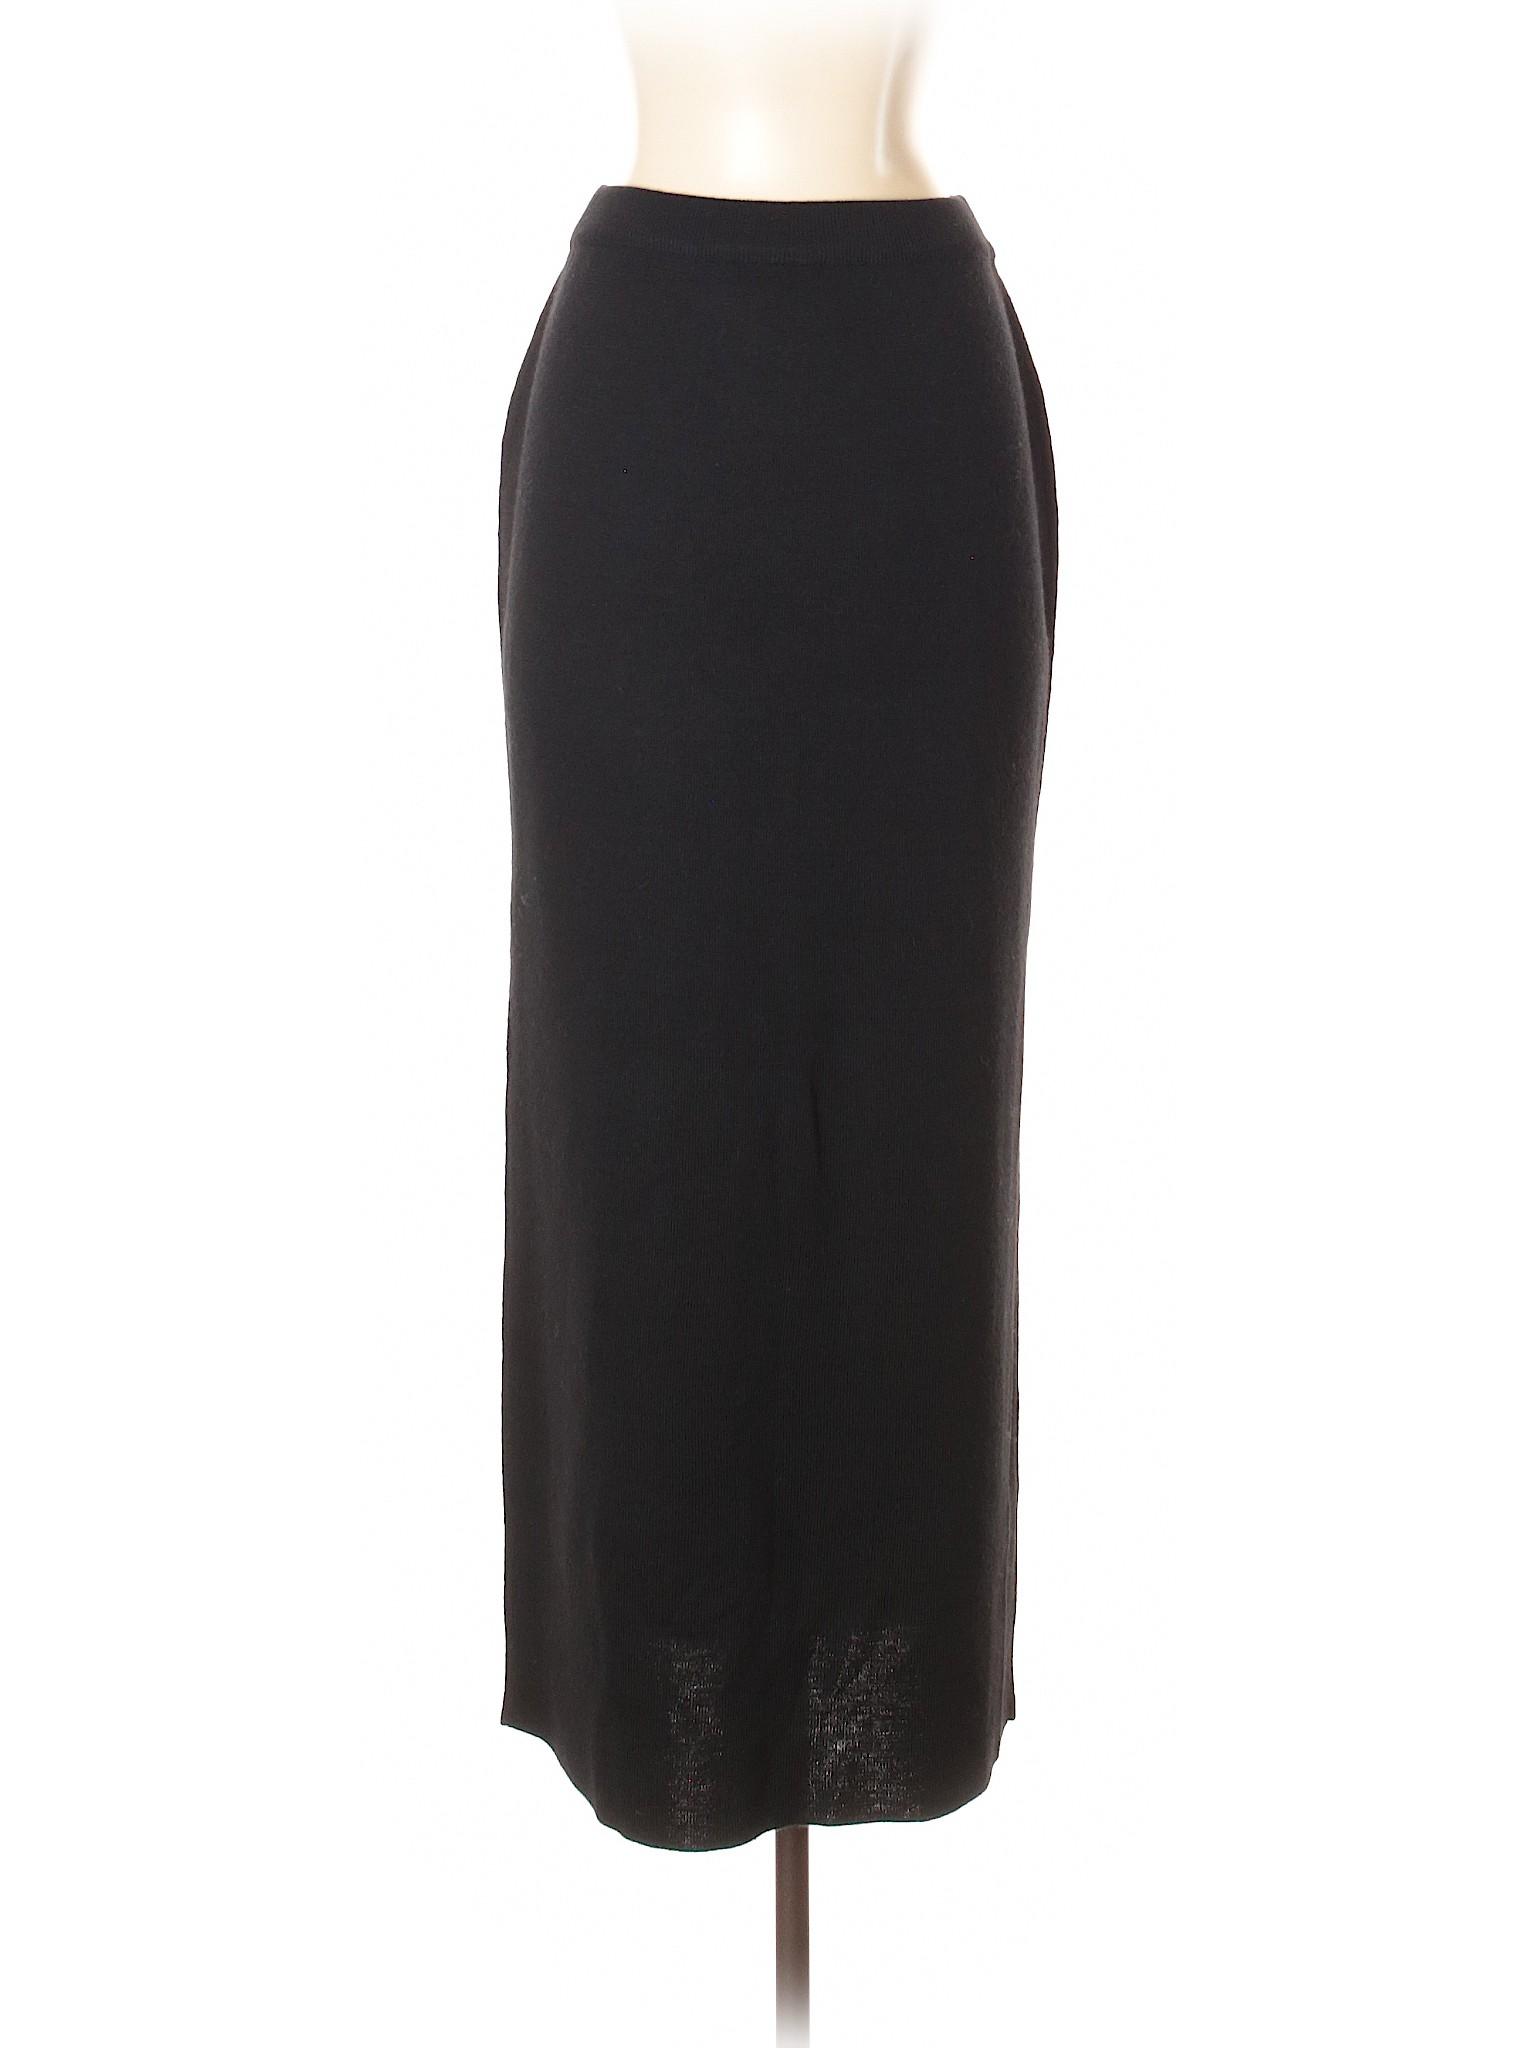 Skirt Casual Casual Casual Boutique Boutique Casual Boutique Skirt Skirt Boutique Skirt zvqAx6wFIA